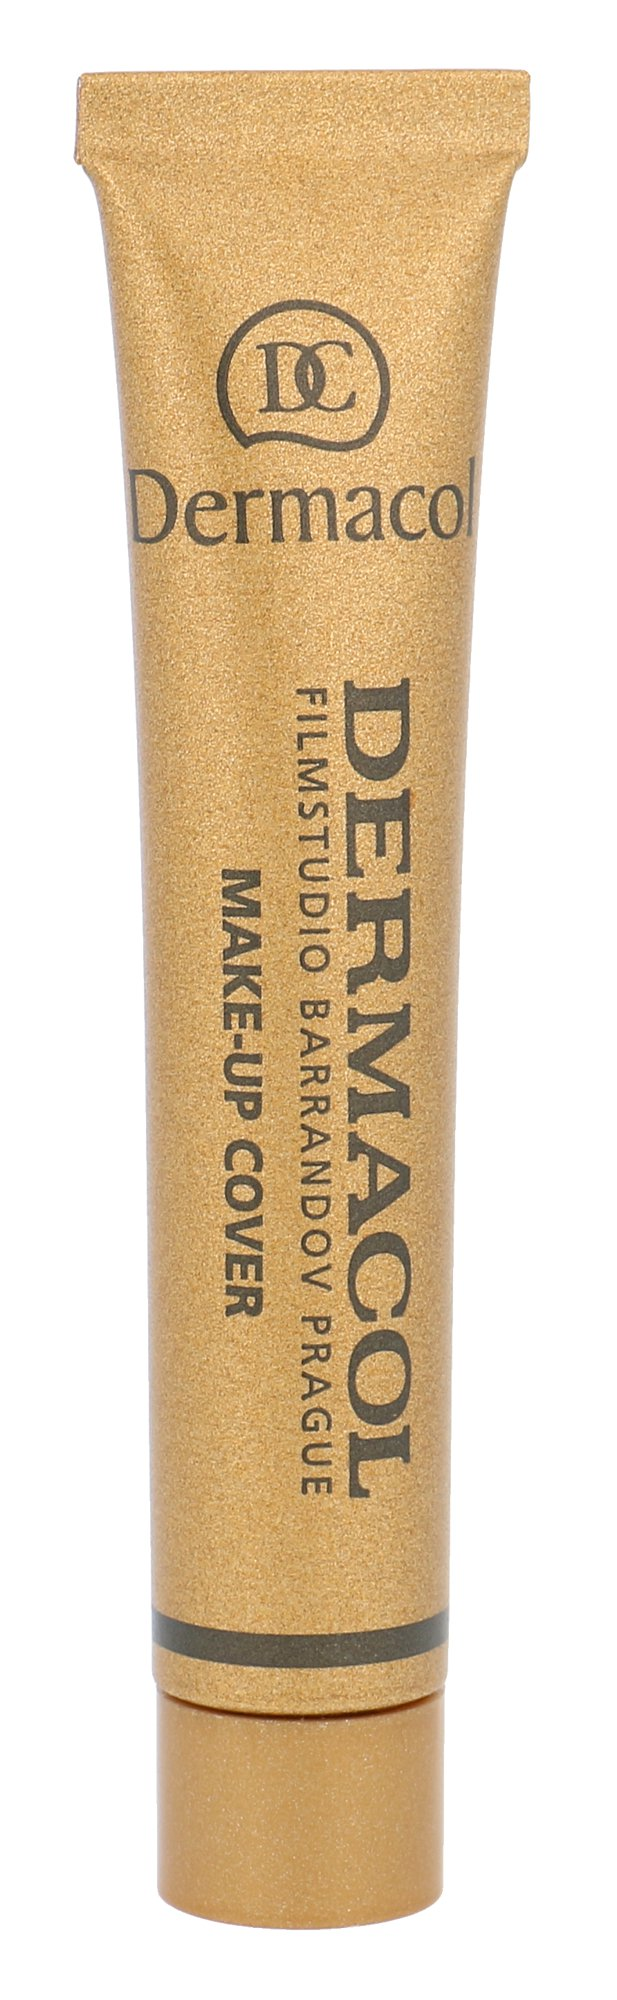 Dermacol Make-Up SPF 30 (221) 30 g 91053